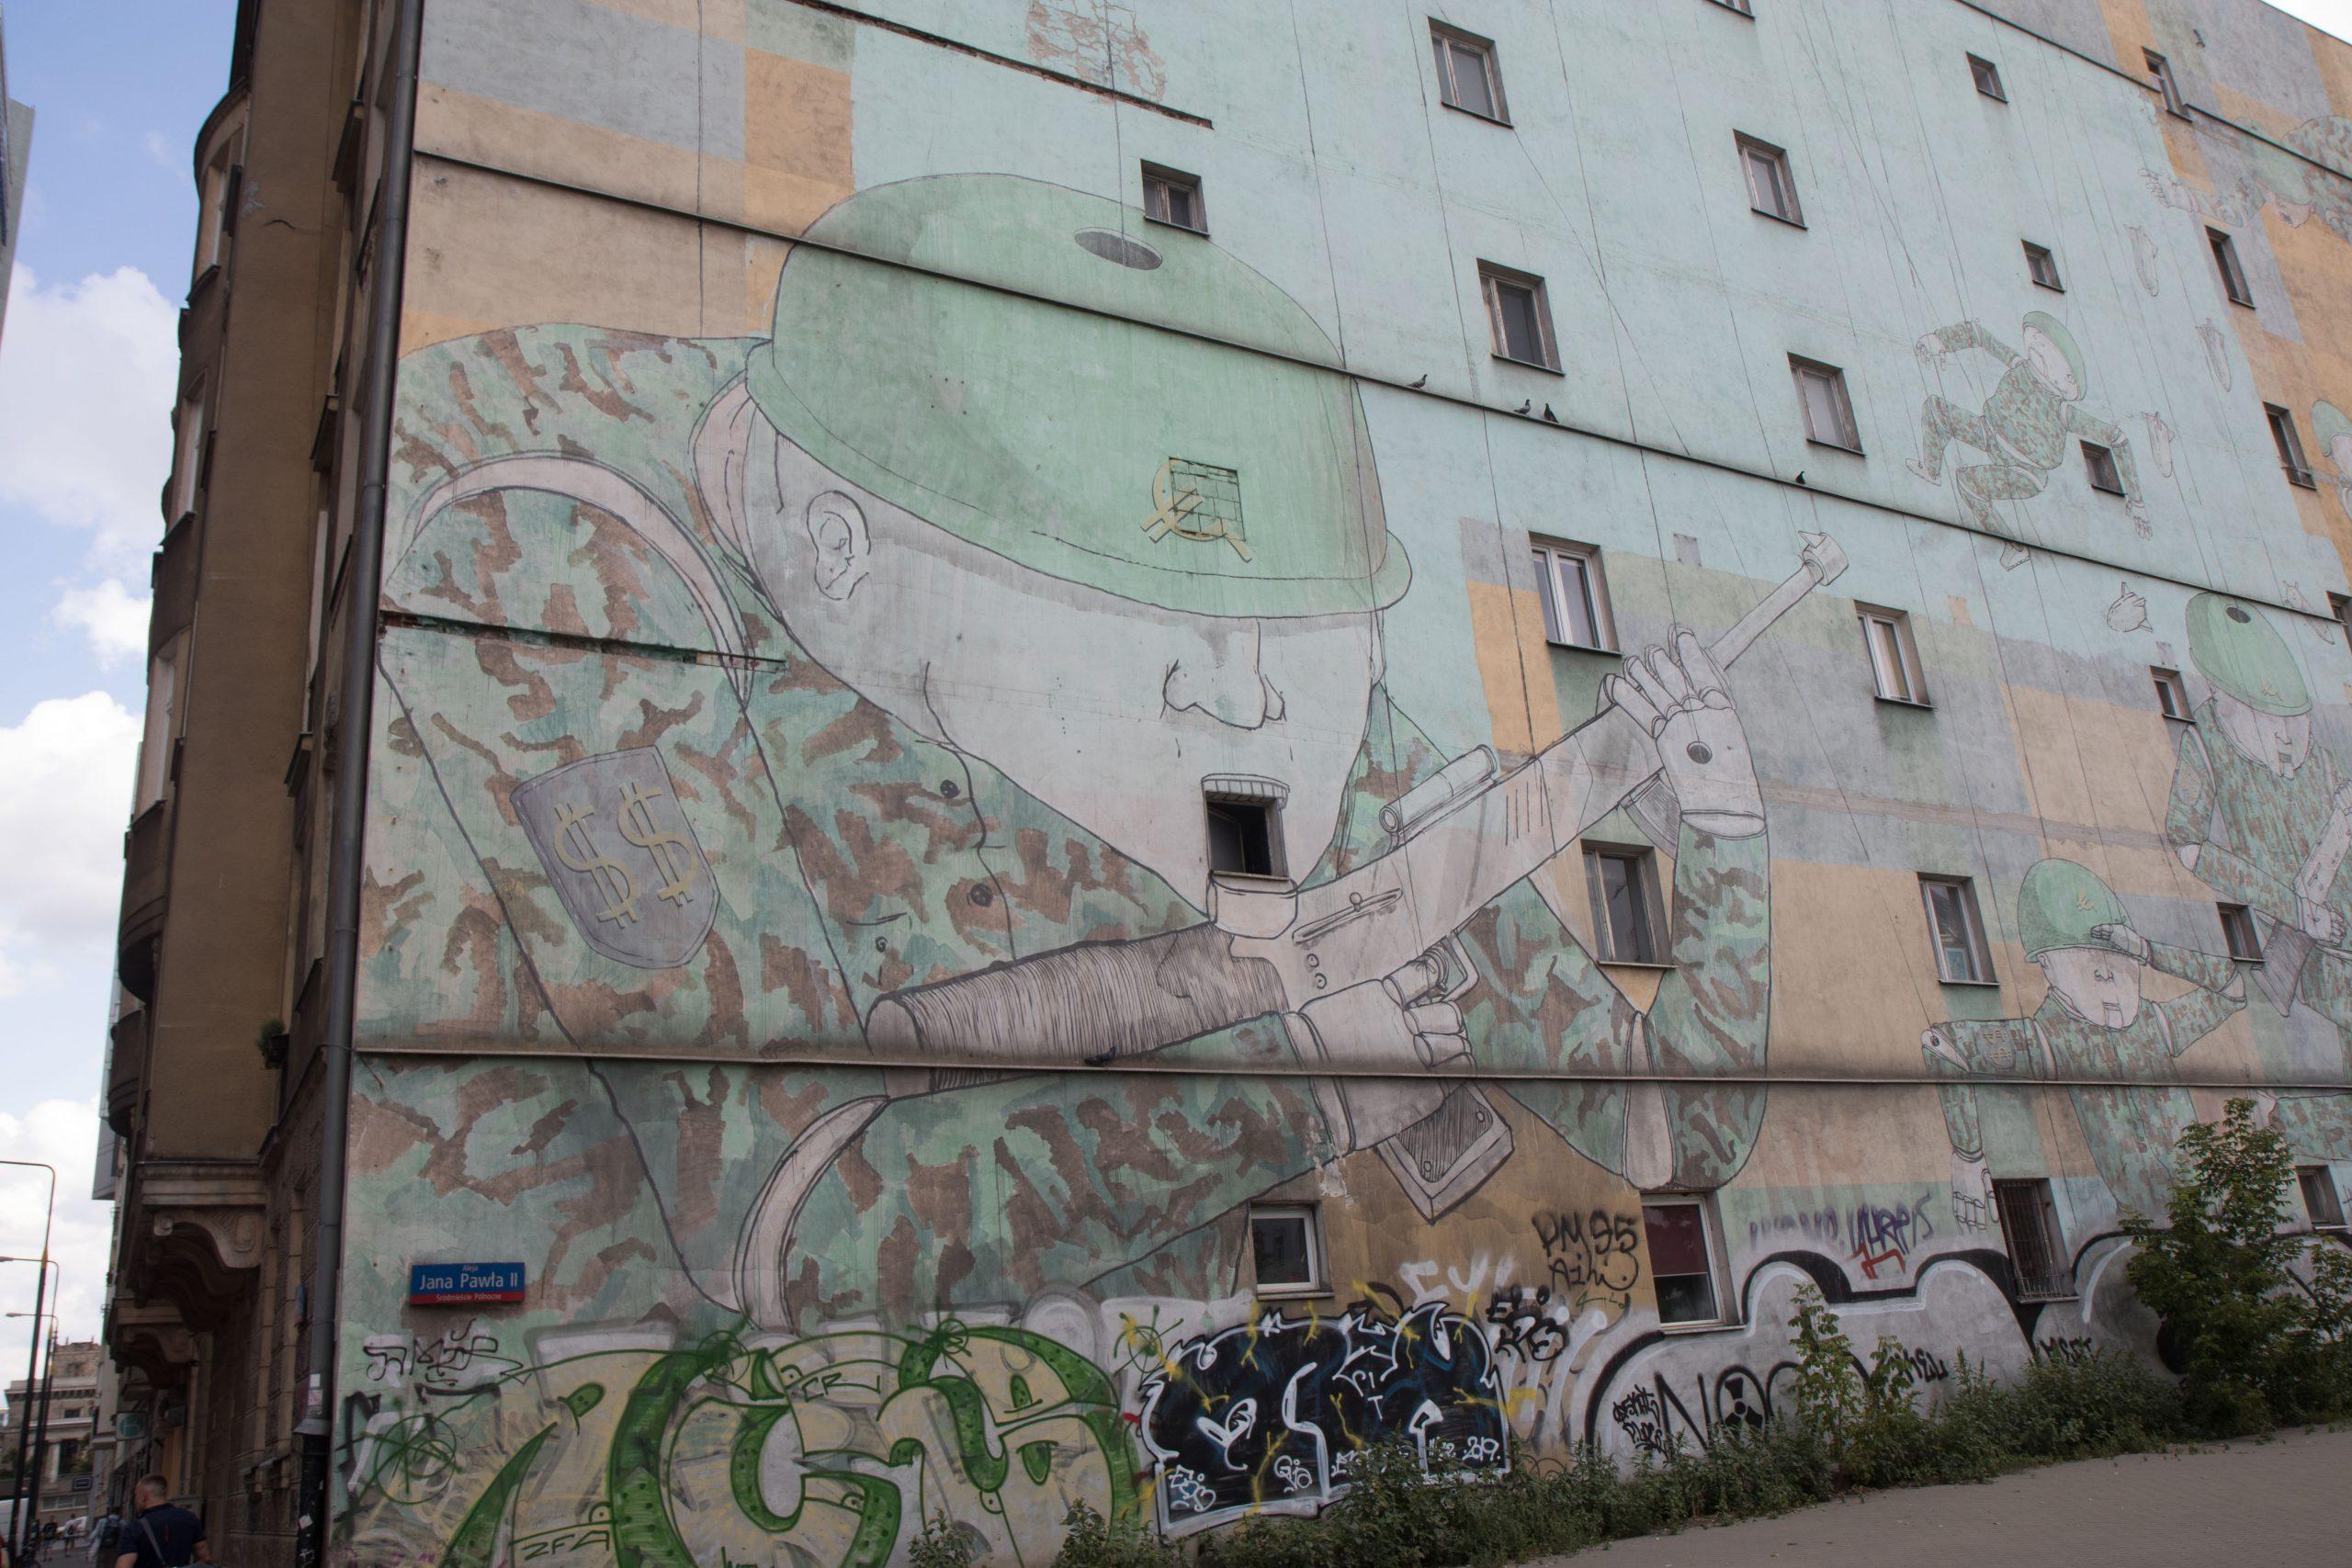 Some interesting graffiti near my place.